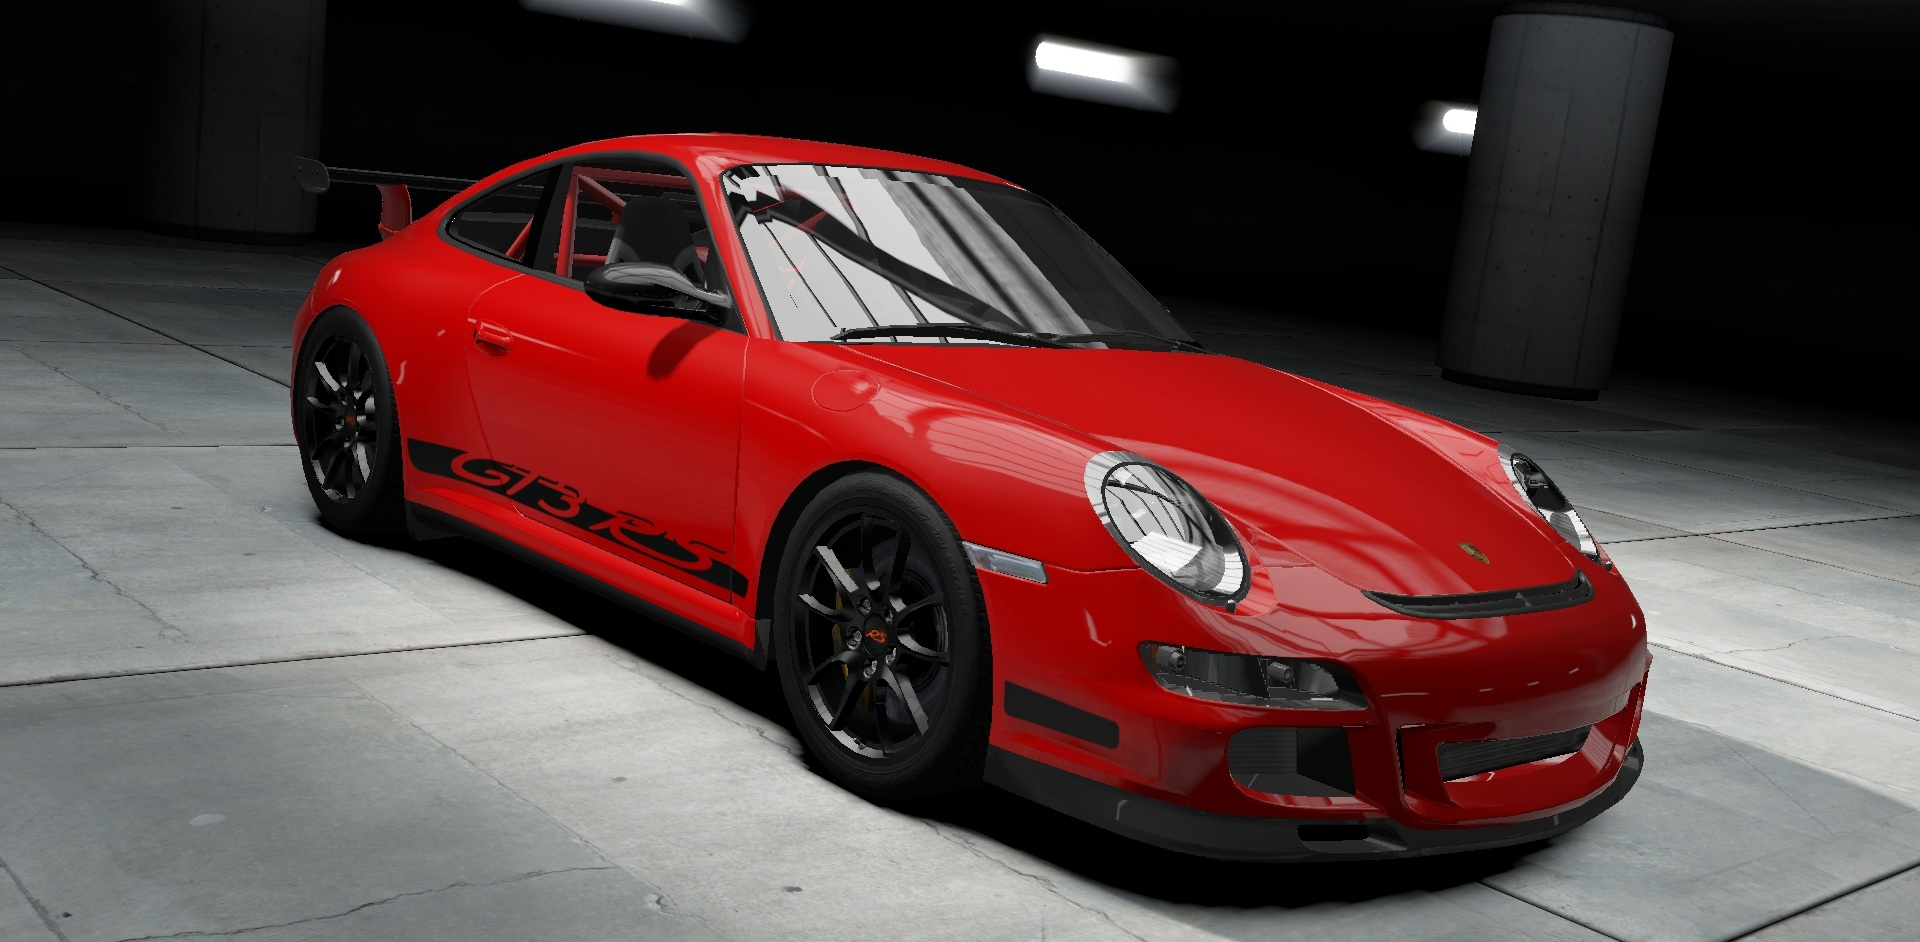 porsche 911 gt3 rs 997 need for speed wiki fandom. Black Bedroom Furniture Sets. Home Design Ideas